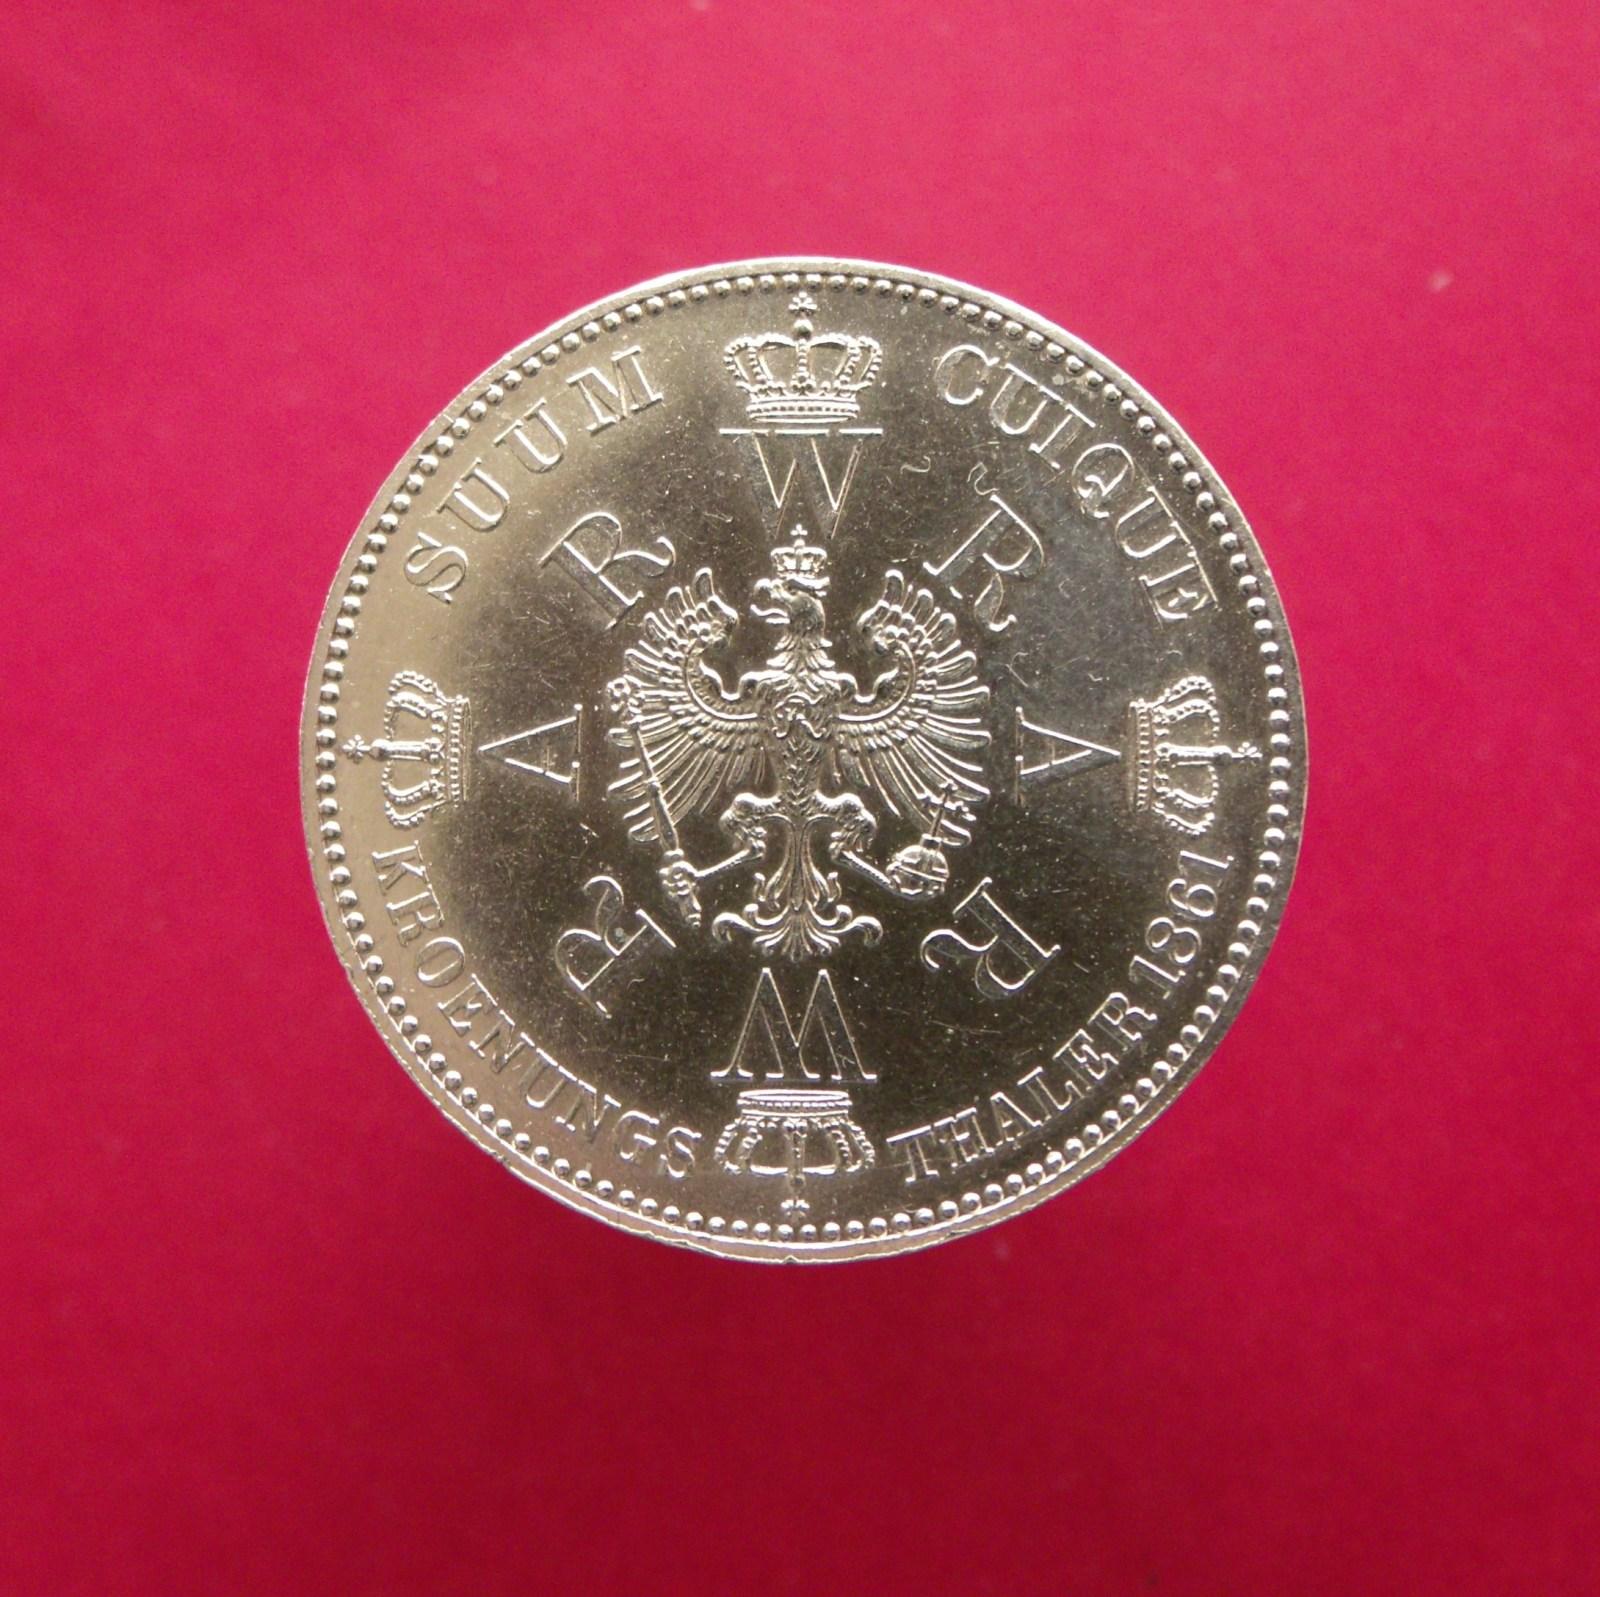 Alemania. Monedas del Reino de Prusia (1701-1918) 2gt6lq9